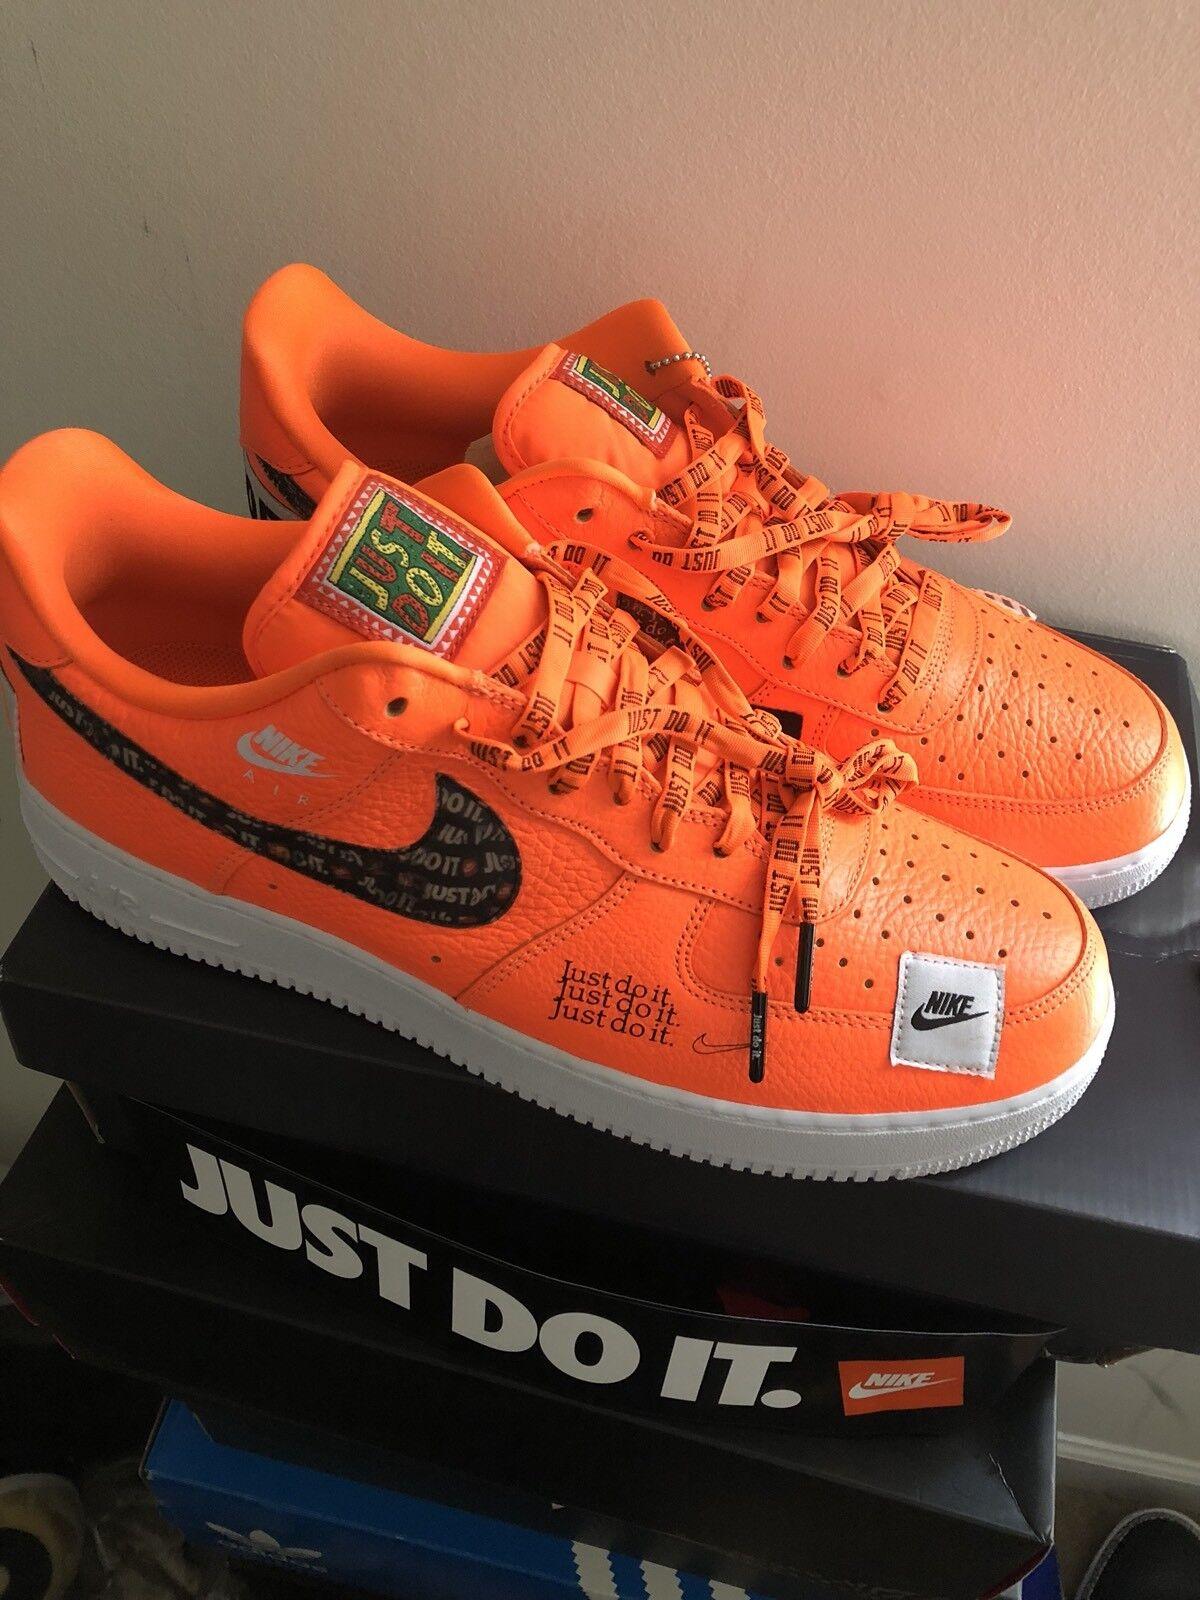 Nike air force 1 jdi (fallo) raccolta orange dimensioni 13